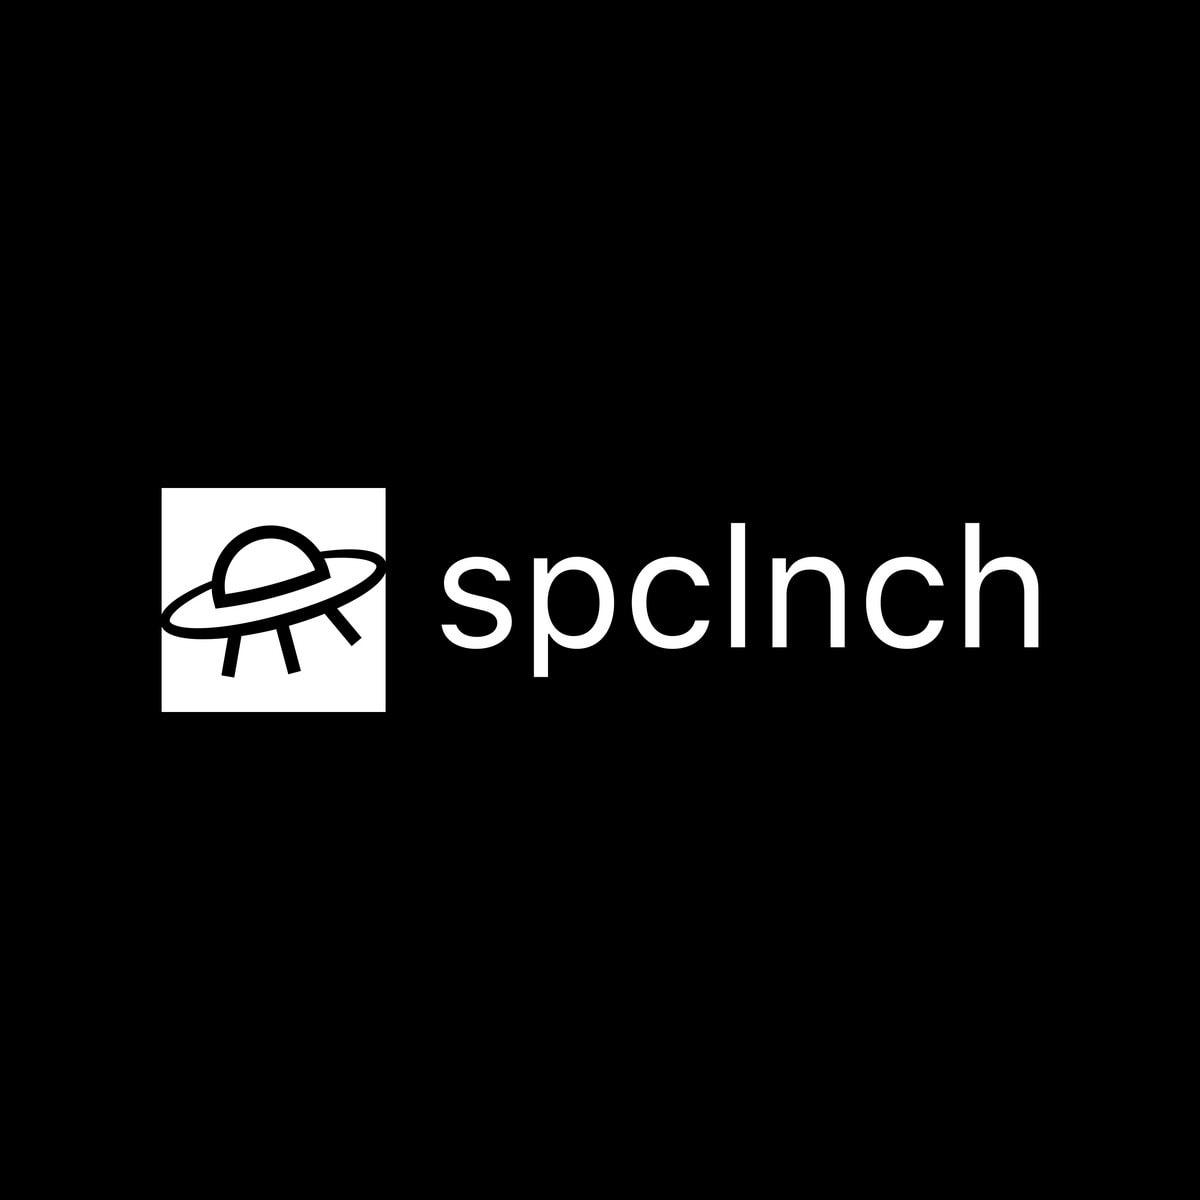 spclnch